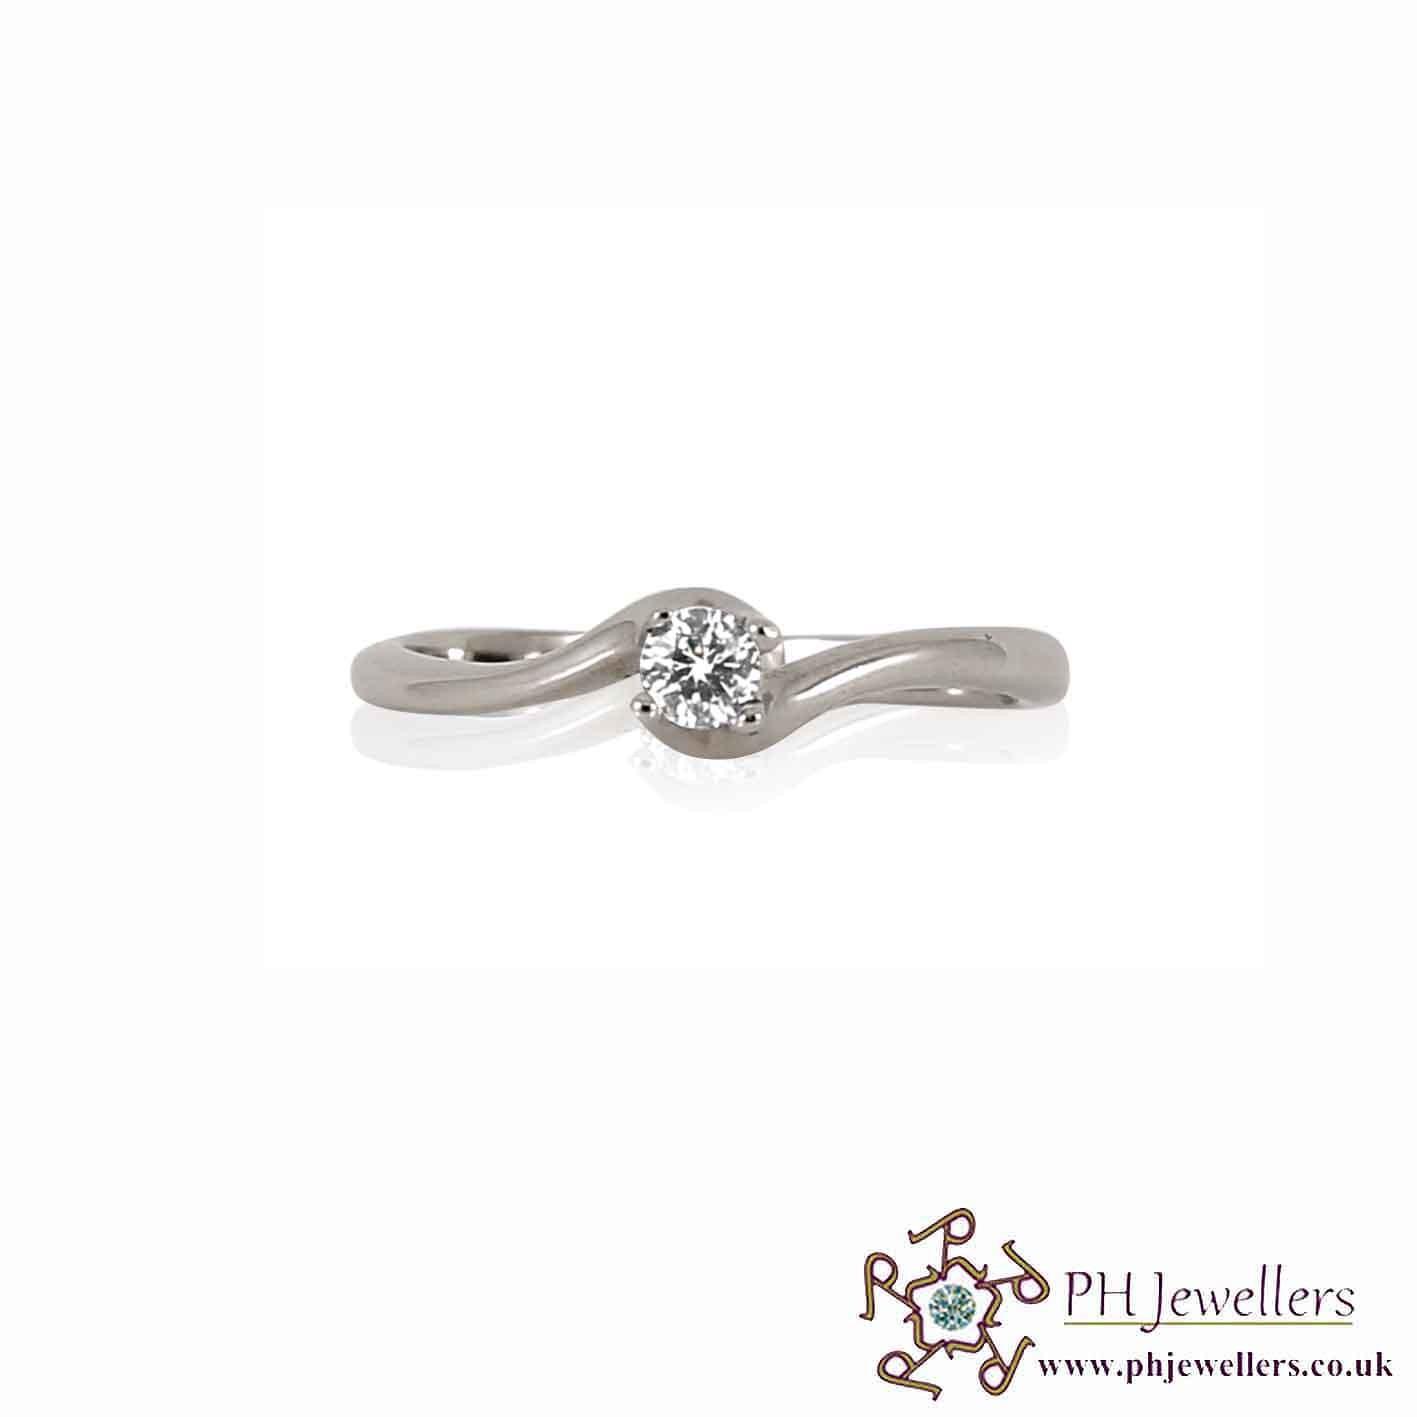 18CT 750 Hallmark White Gold Engagement Size M Ring CZ WGR7